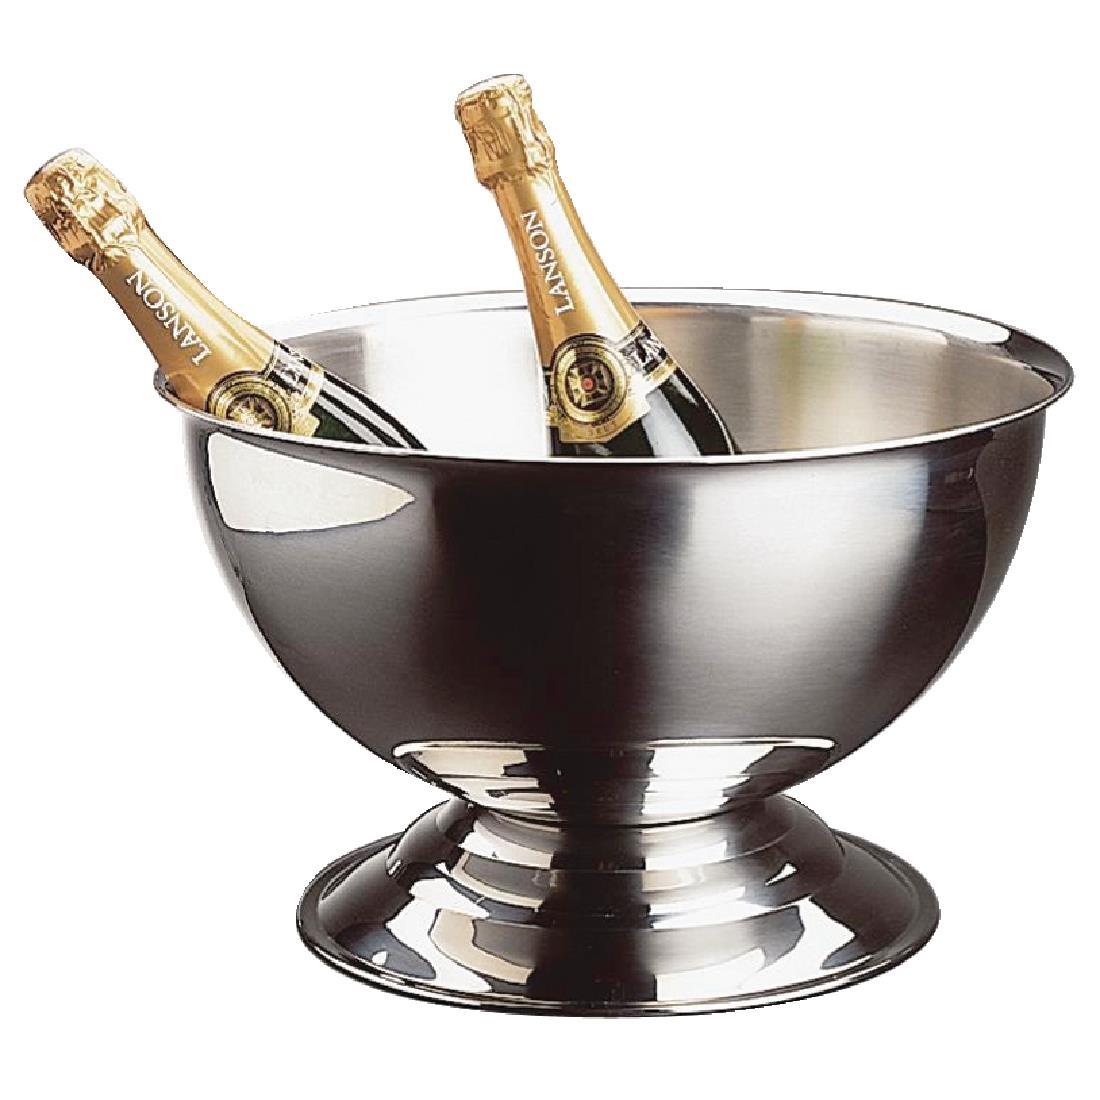 u217--champagne-bowl